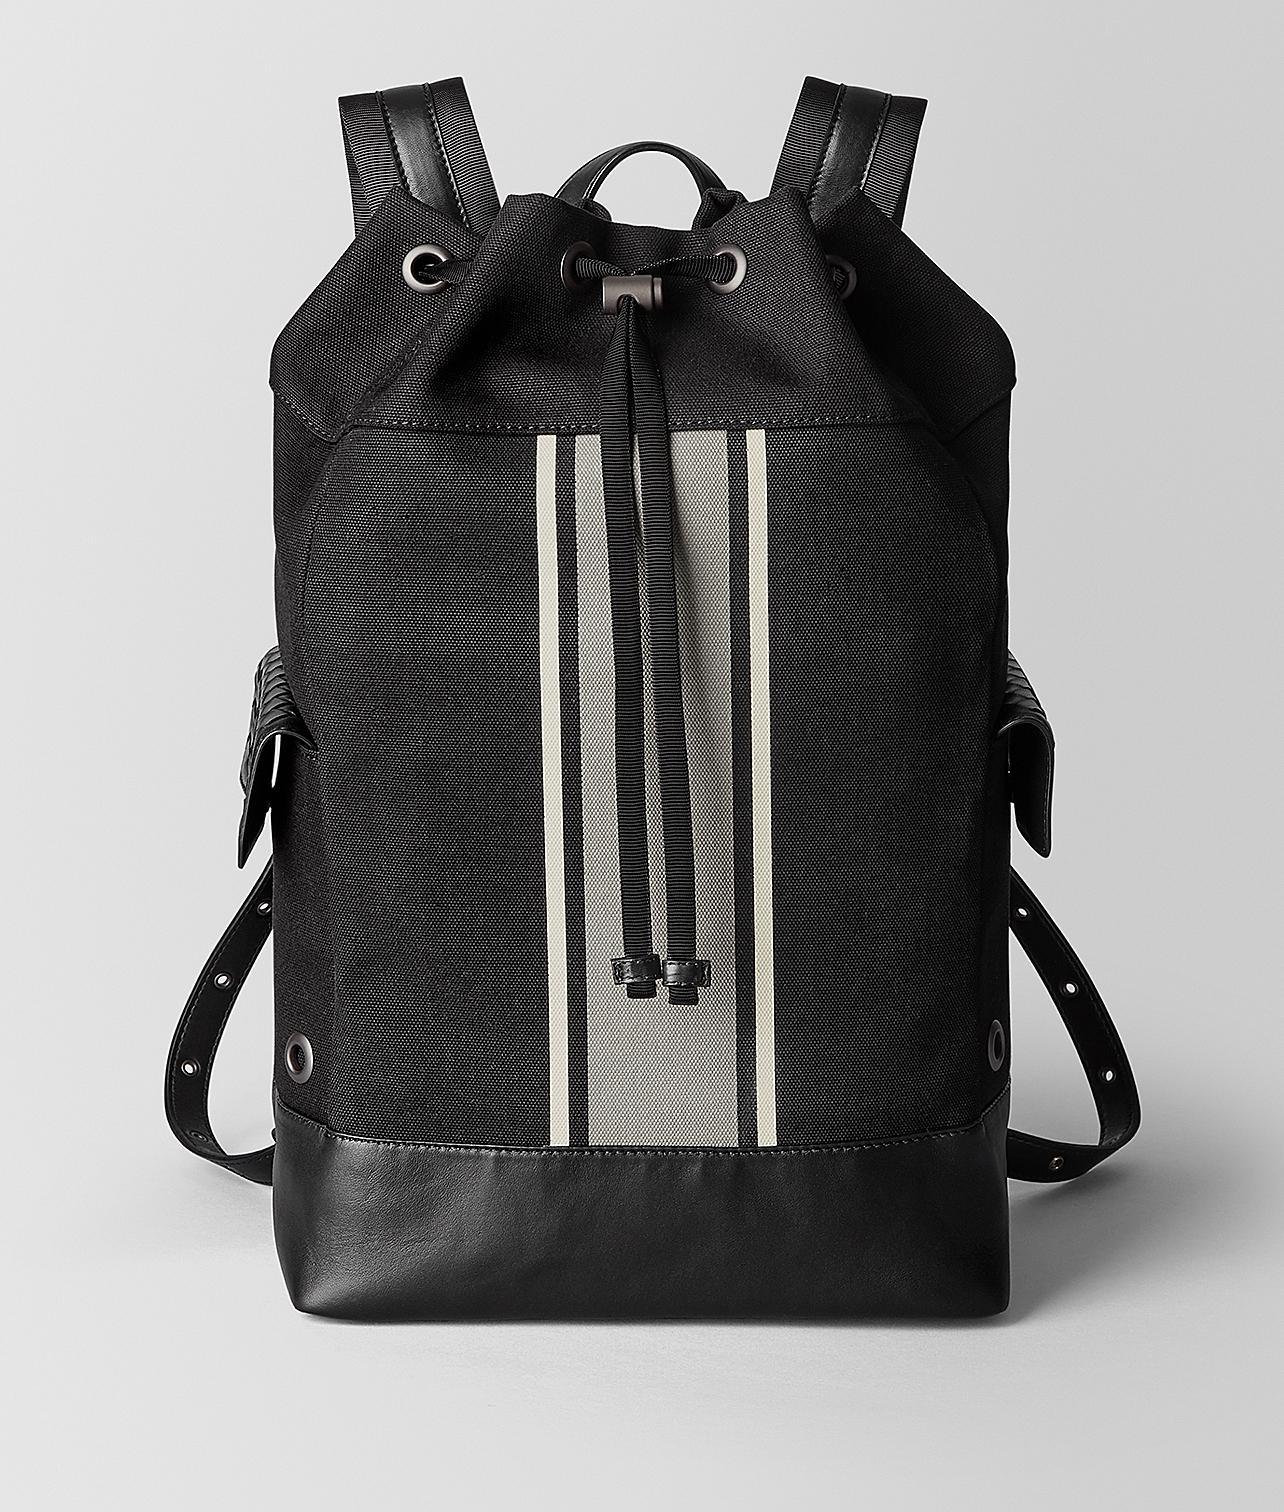 d6c3f2b7bfc3 Bottega Veneta Nero cement Canvas Backpack in Black for Men - Lyst